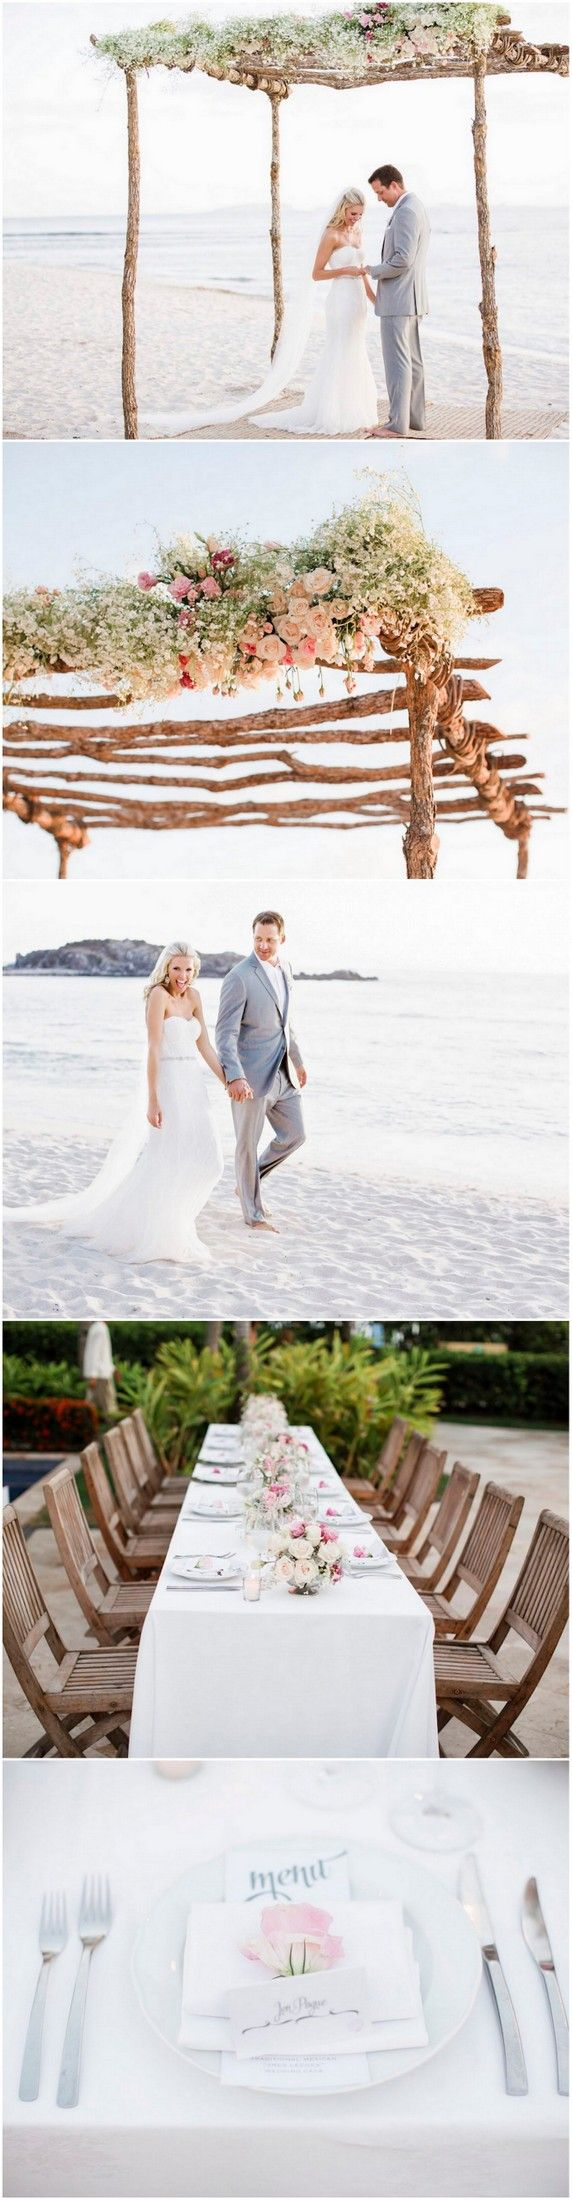 Dreamy Blush Punta Mita Destination Beach Wedding!